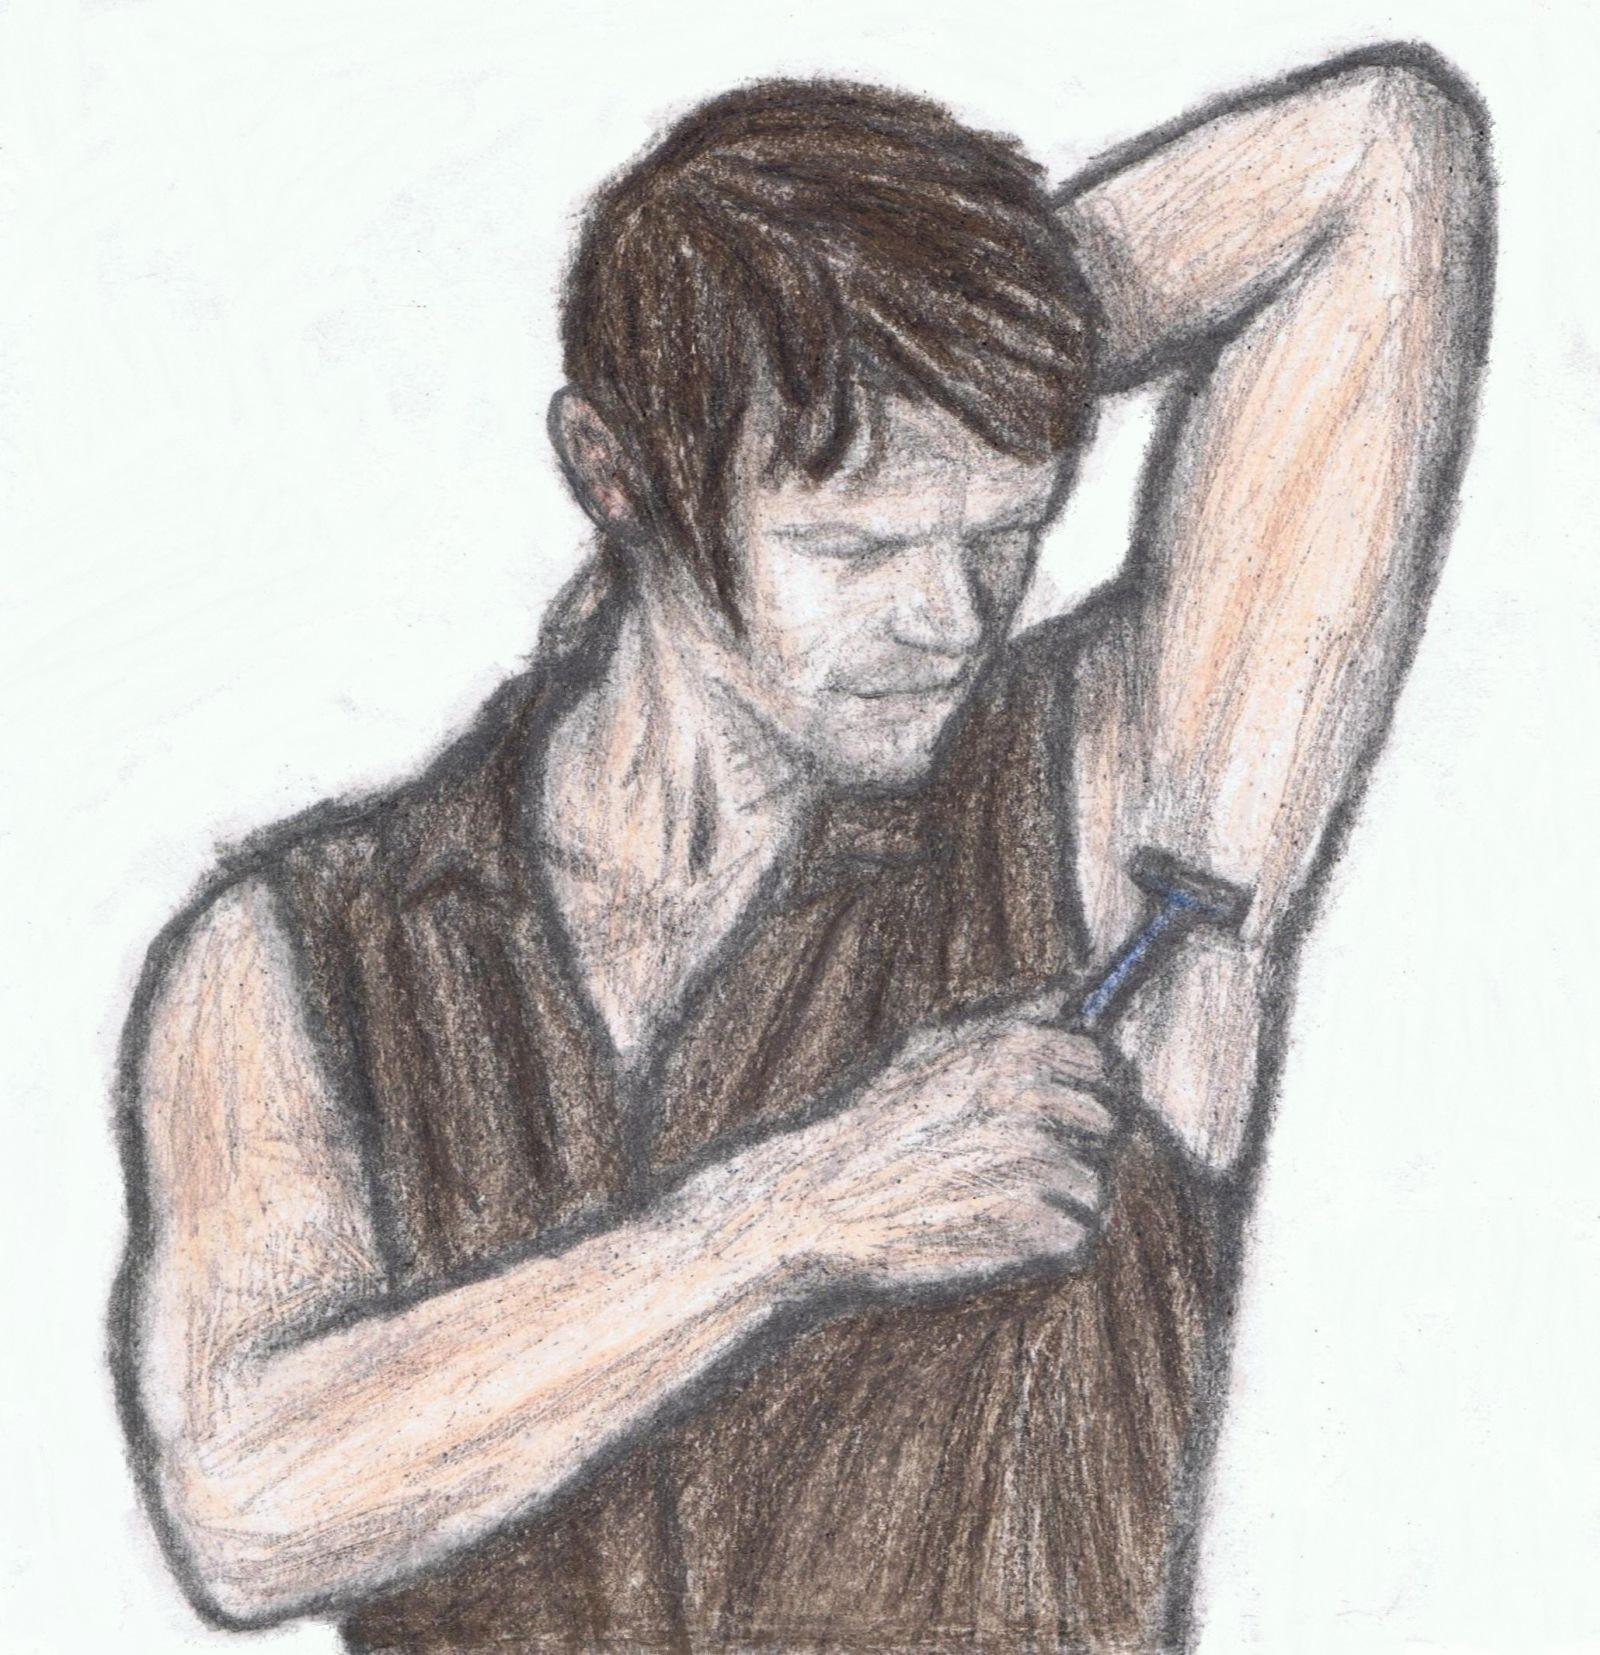 Daryl Dixon shaving his armpit by gagambo